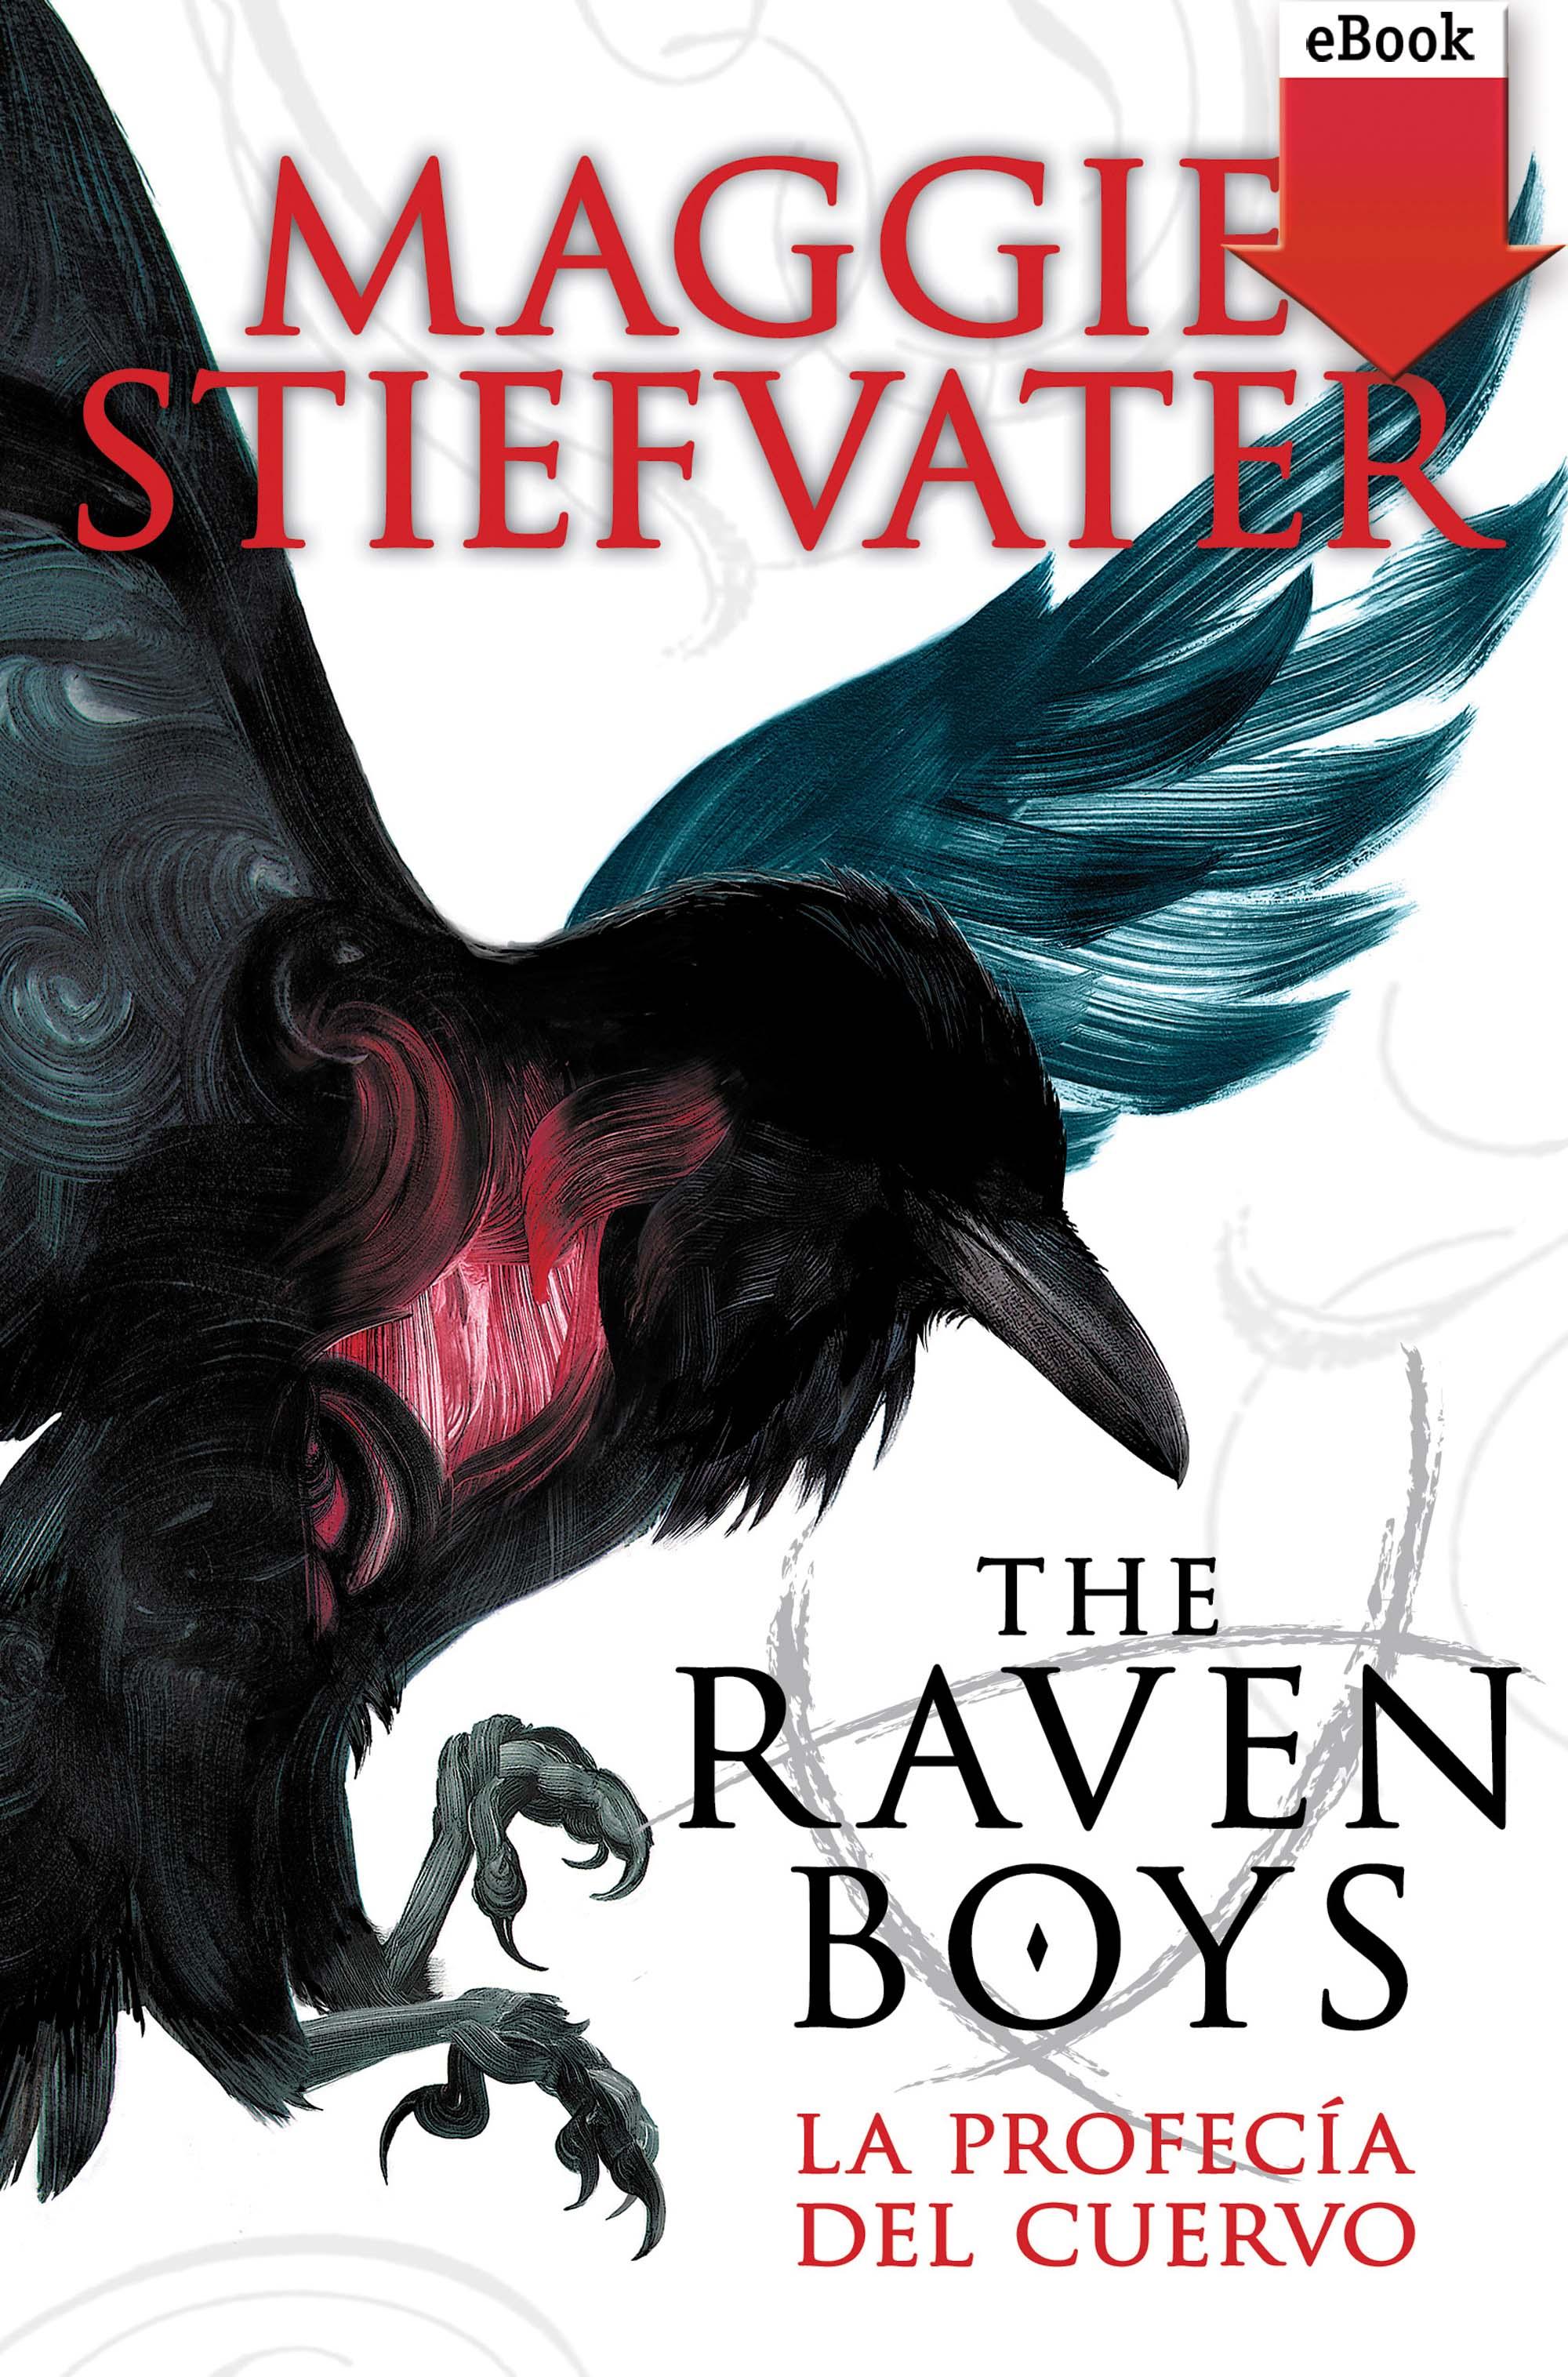 Maggie Stiefvater The raven boys: La profecía del cuervo maggie stiefvater raven king